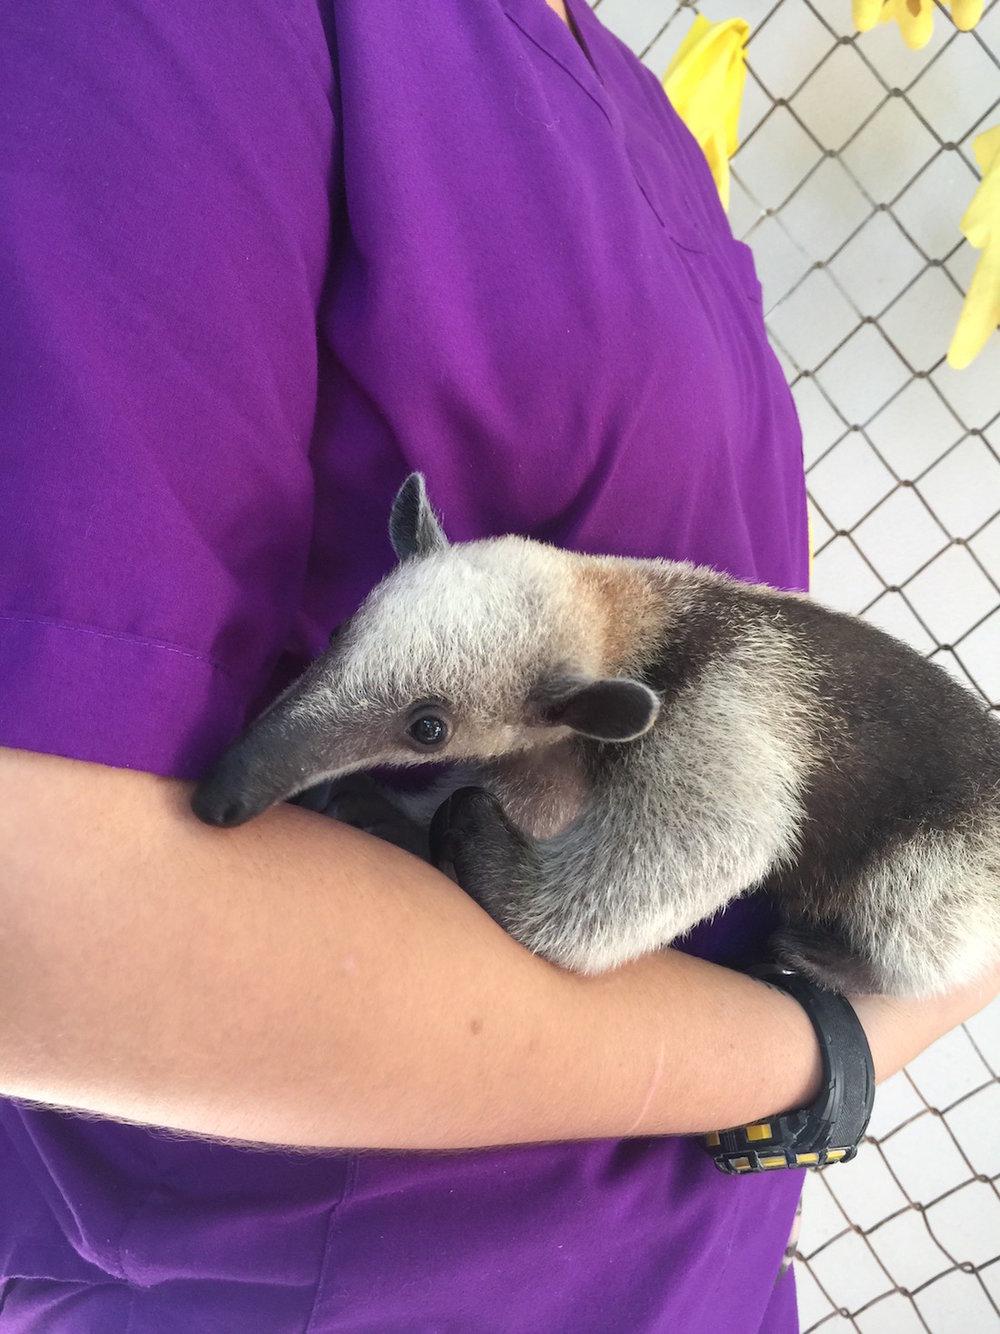 Costa-Rica-animal-rescue-anteater.jpg